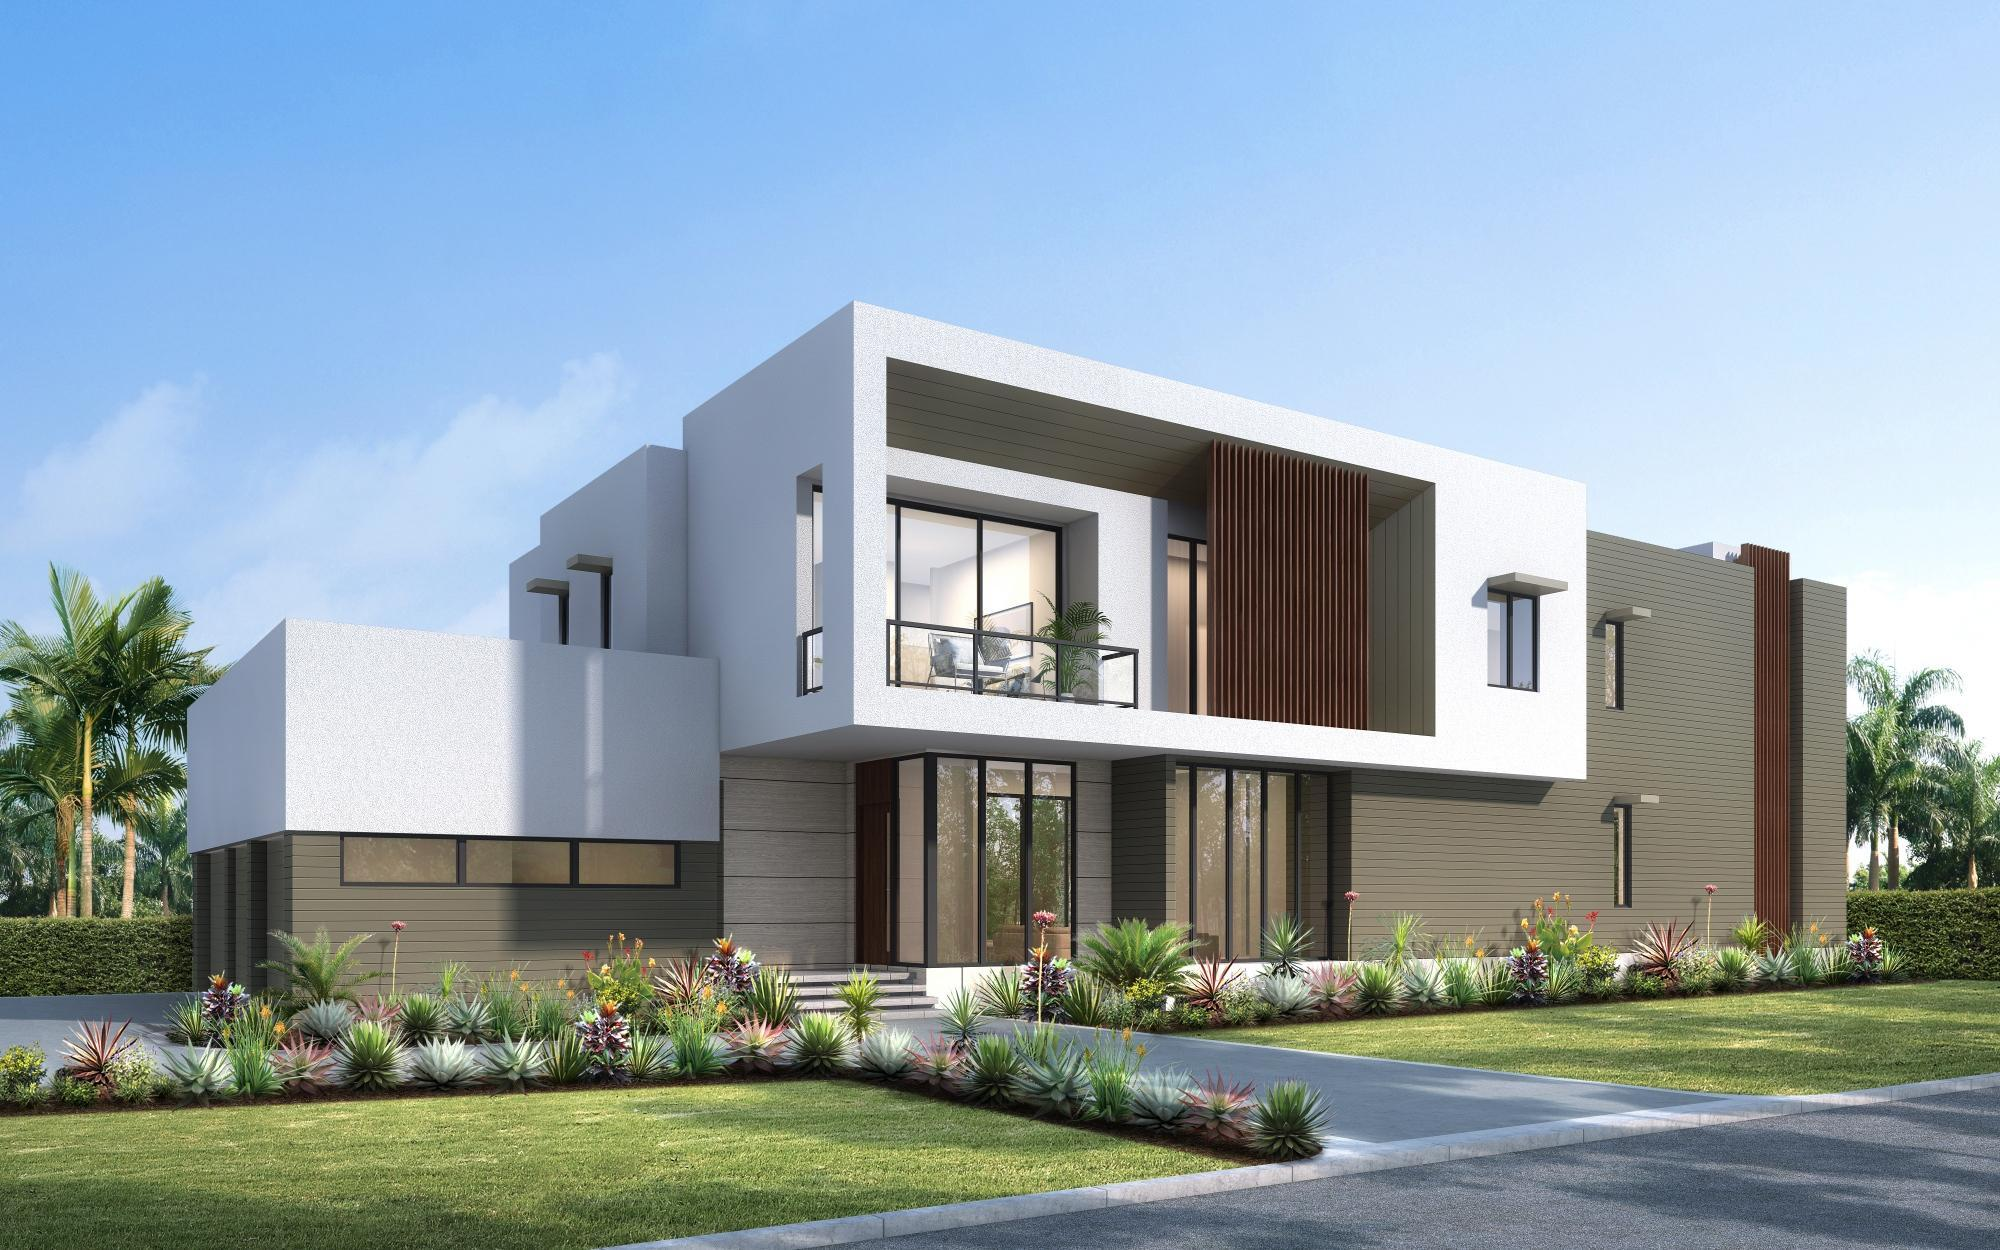 901 7th Avenue, Delray Beach, Florida 33483, 5 Bedrooms Bedrooms, ,6.1 BathroomsBathrooms,Single Family Detached,For Sale,7th,RX-10749983